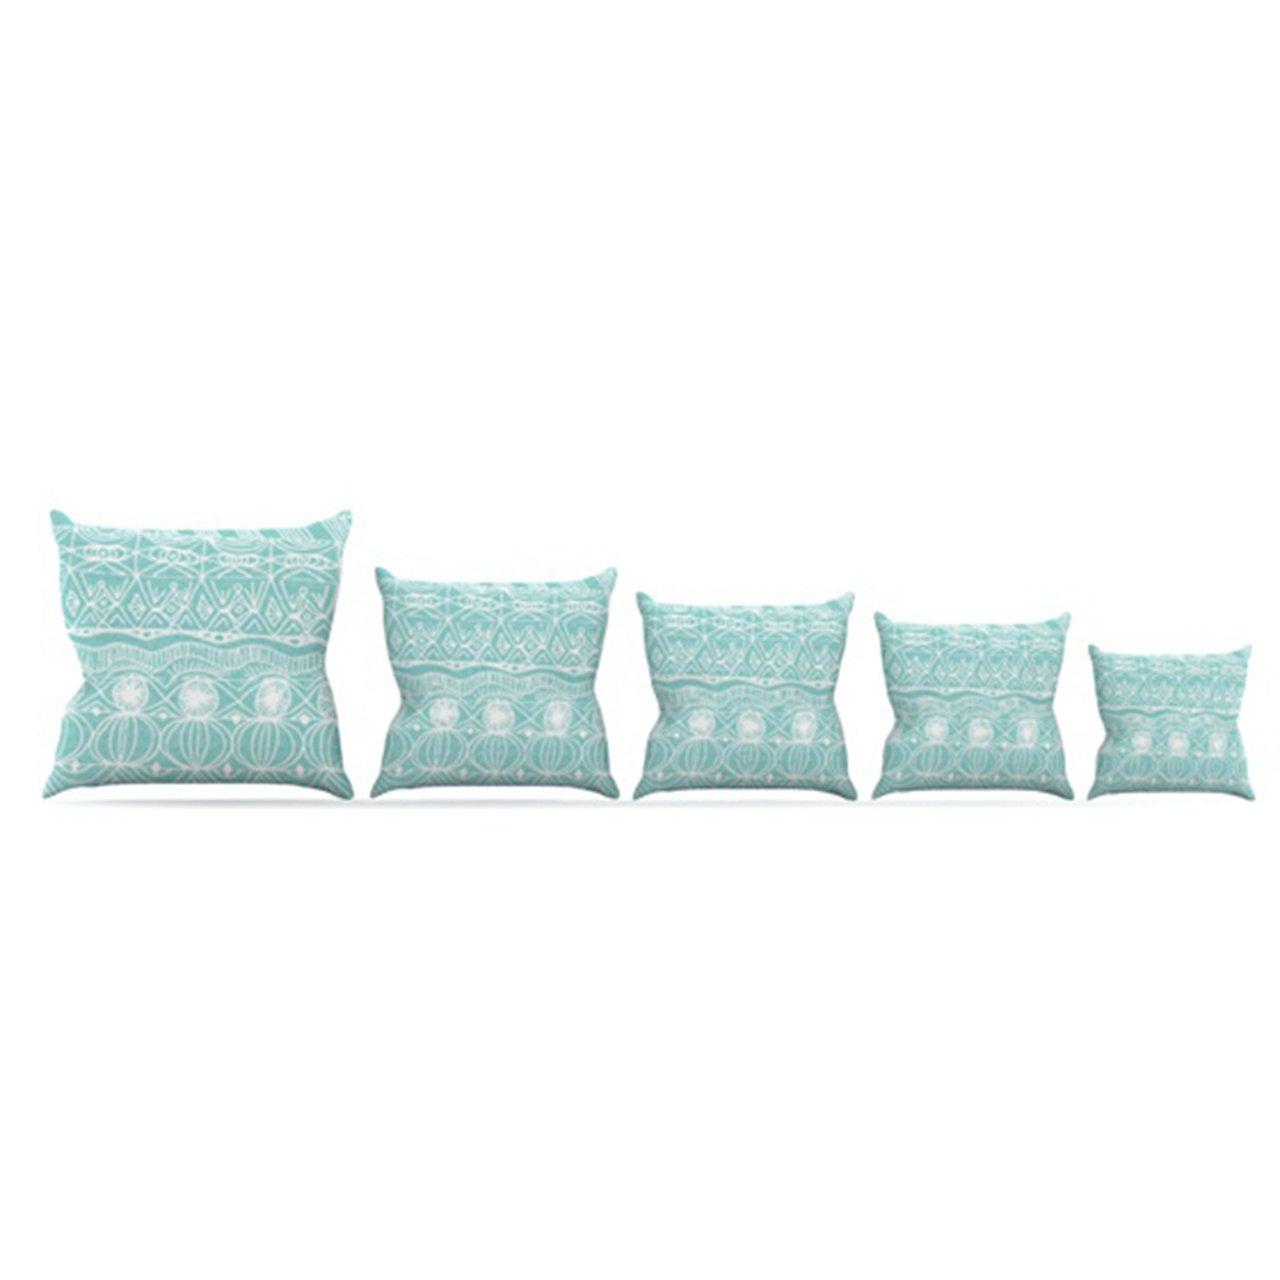 Kess InHouse Catherine Holcombe Beach Blanket Bingo Throw Pillow, 18 by 18-Inch